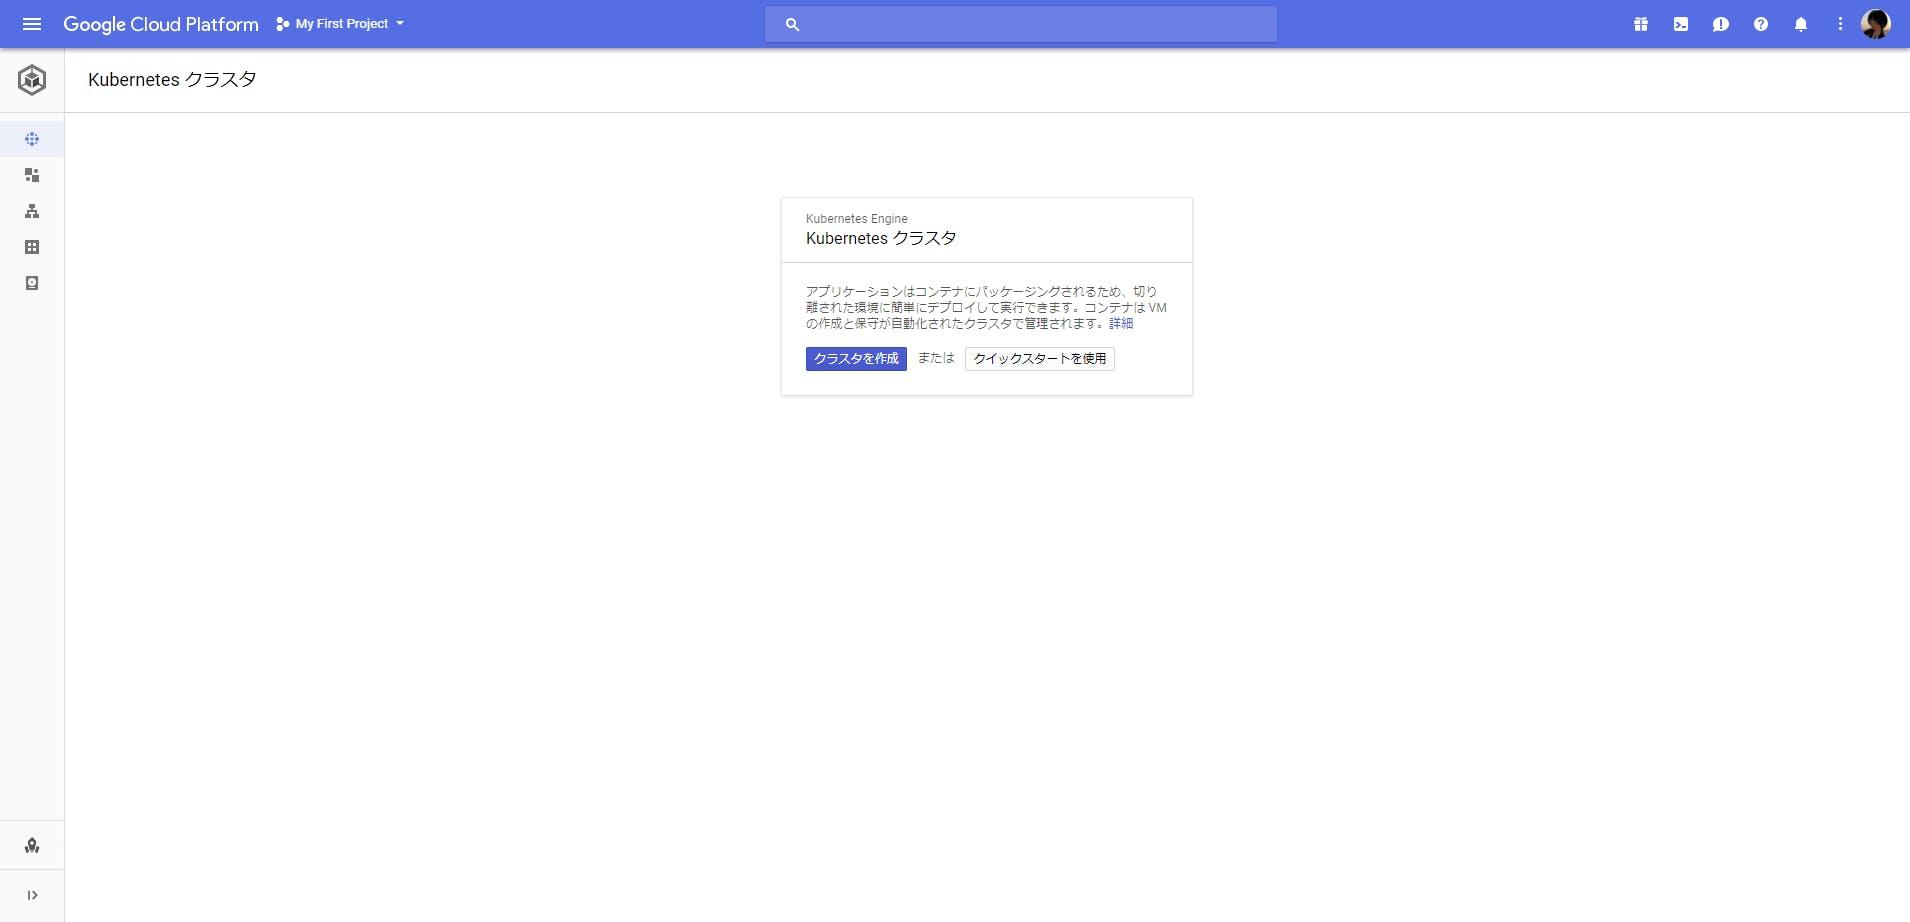 screencapture-console-cloud-google-kubernetes-list-2018-03-13-15_51_22.png